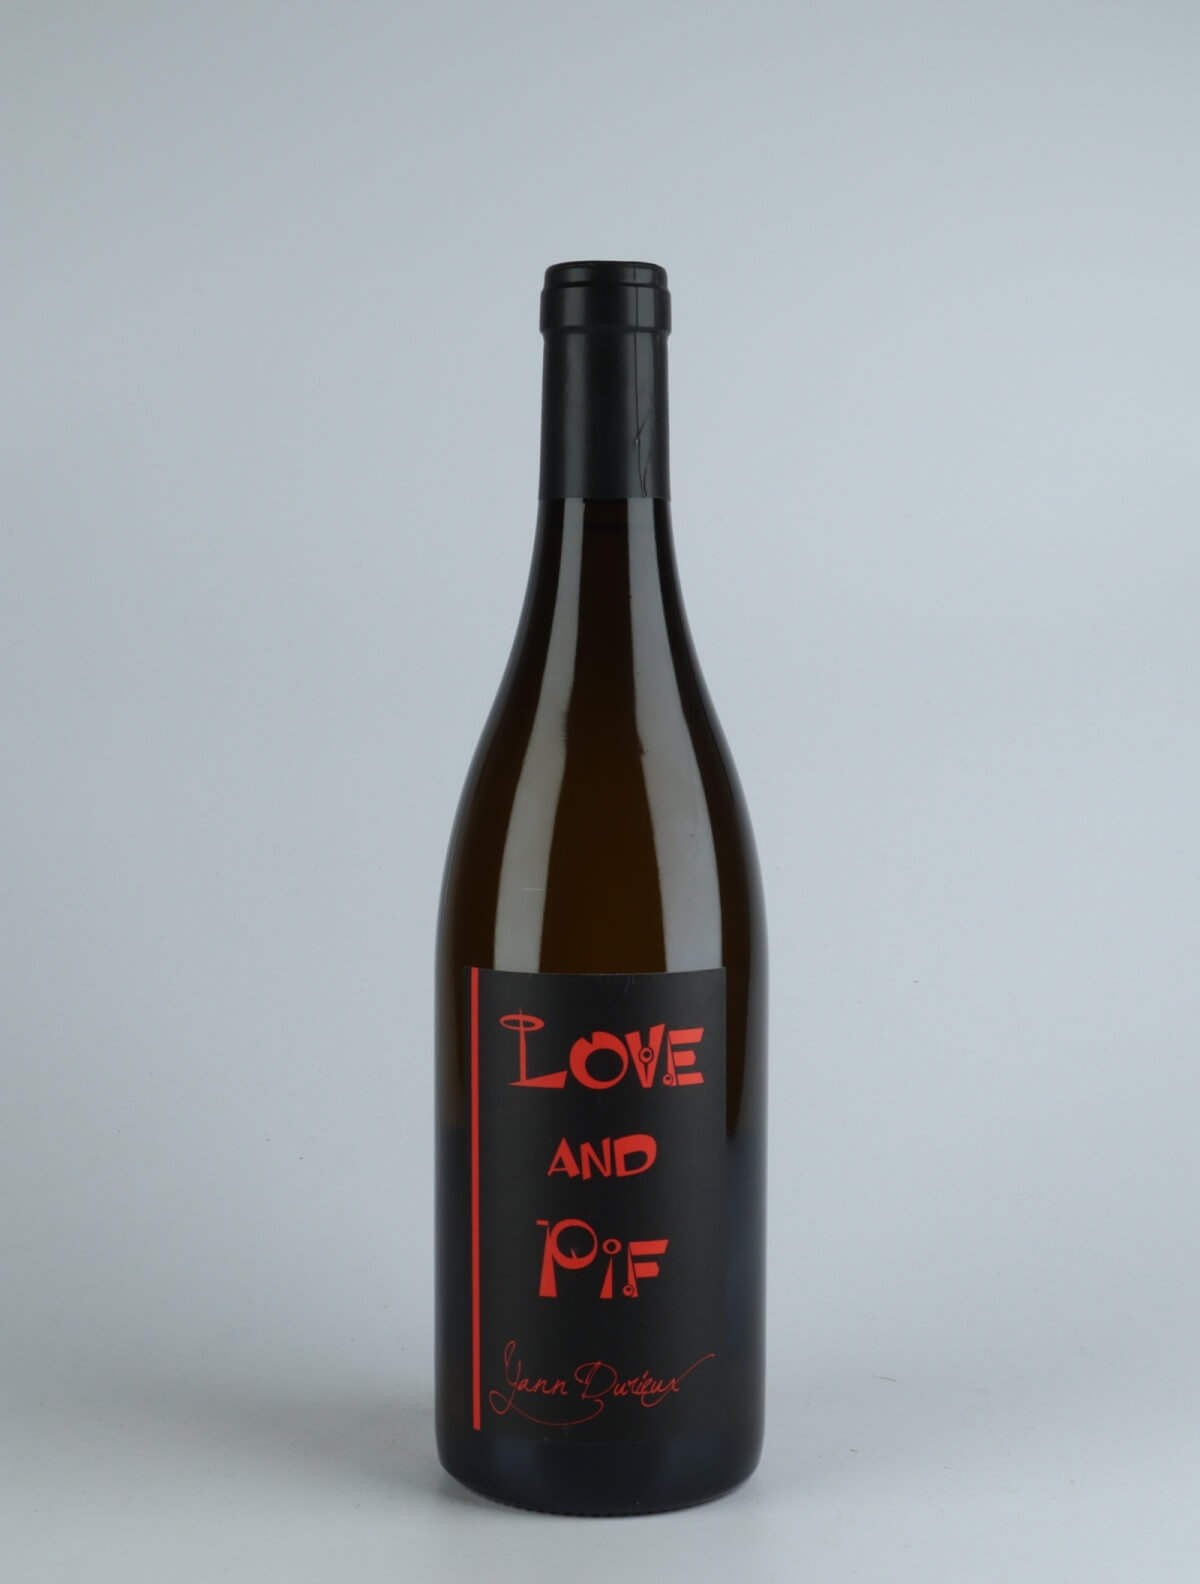 Aligoté - Love and Pif